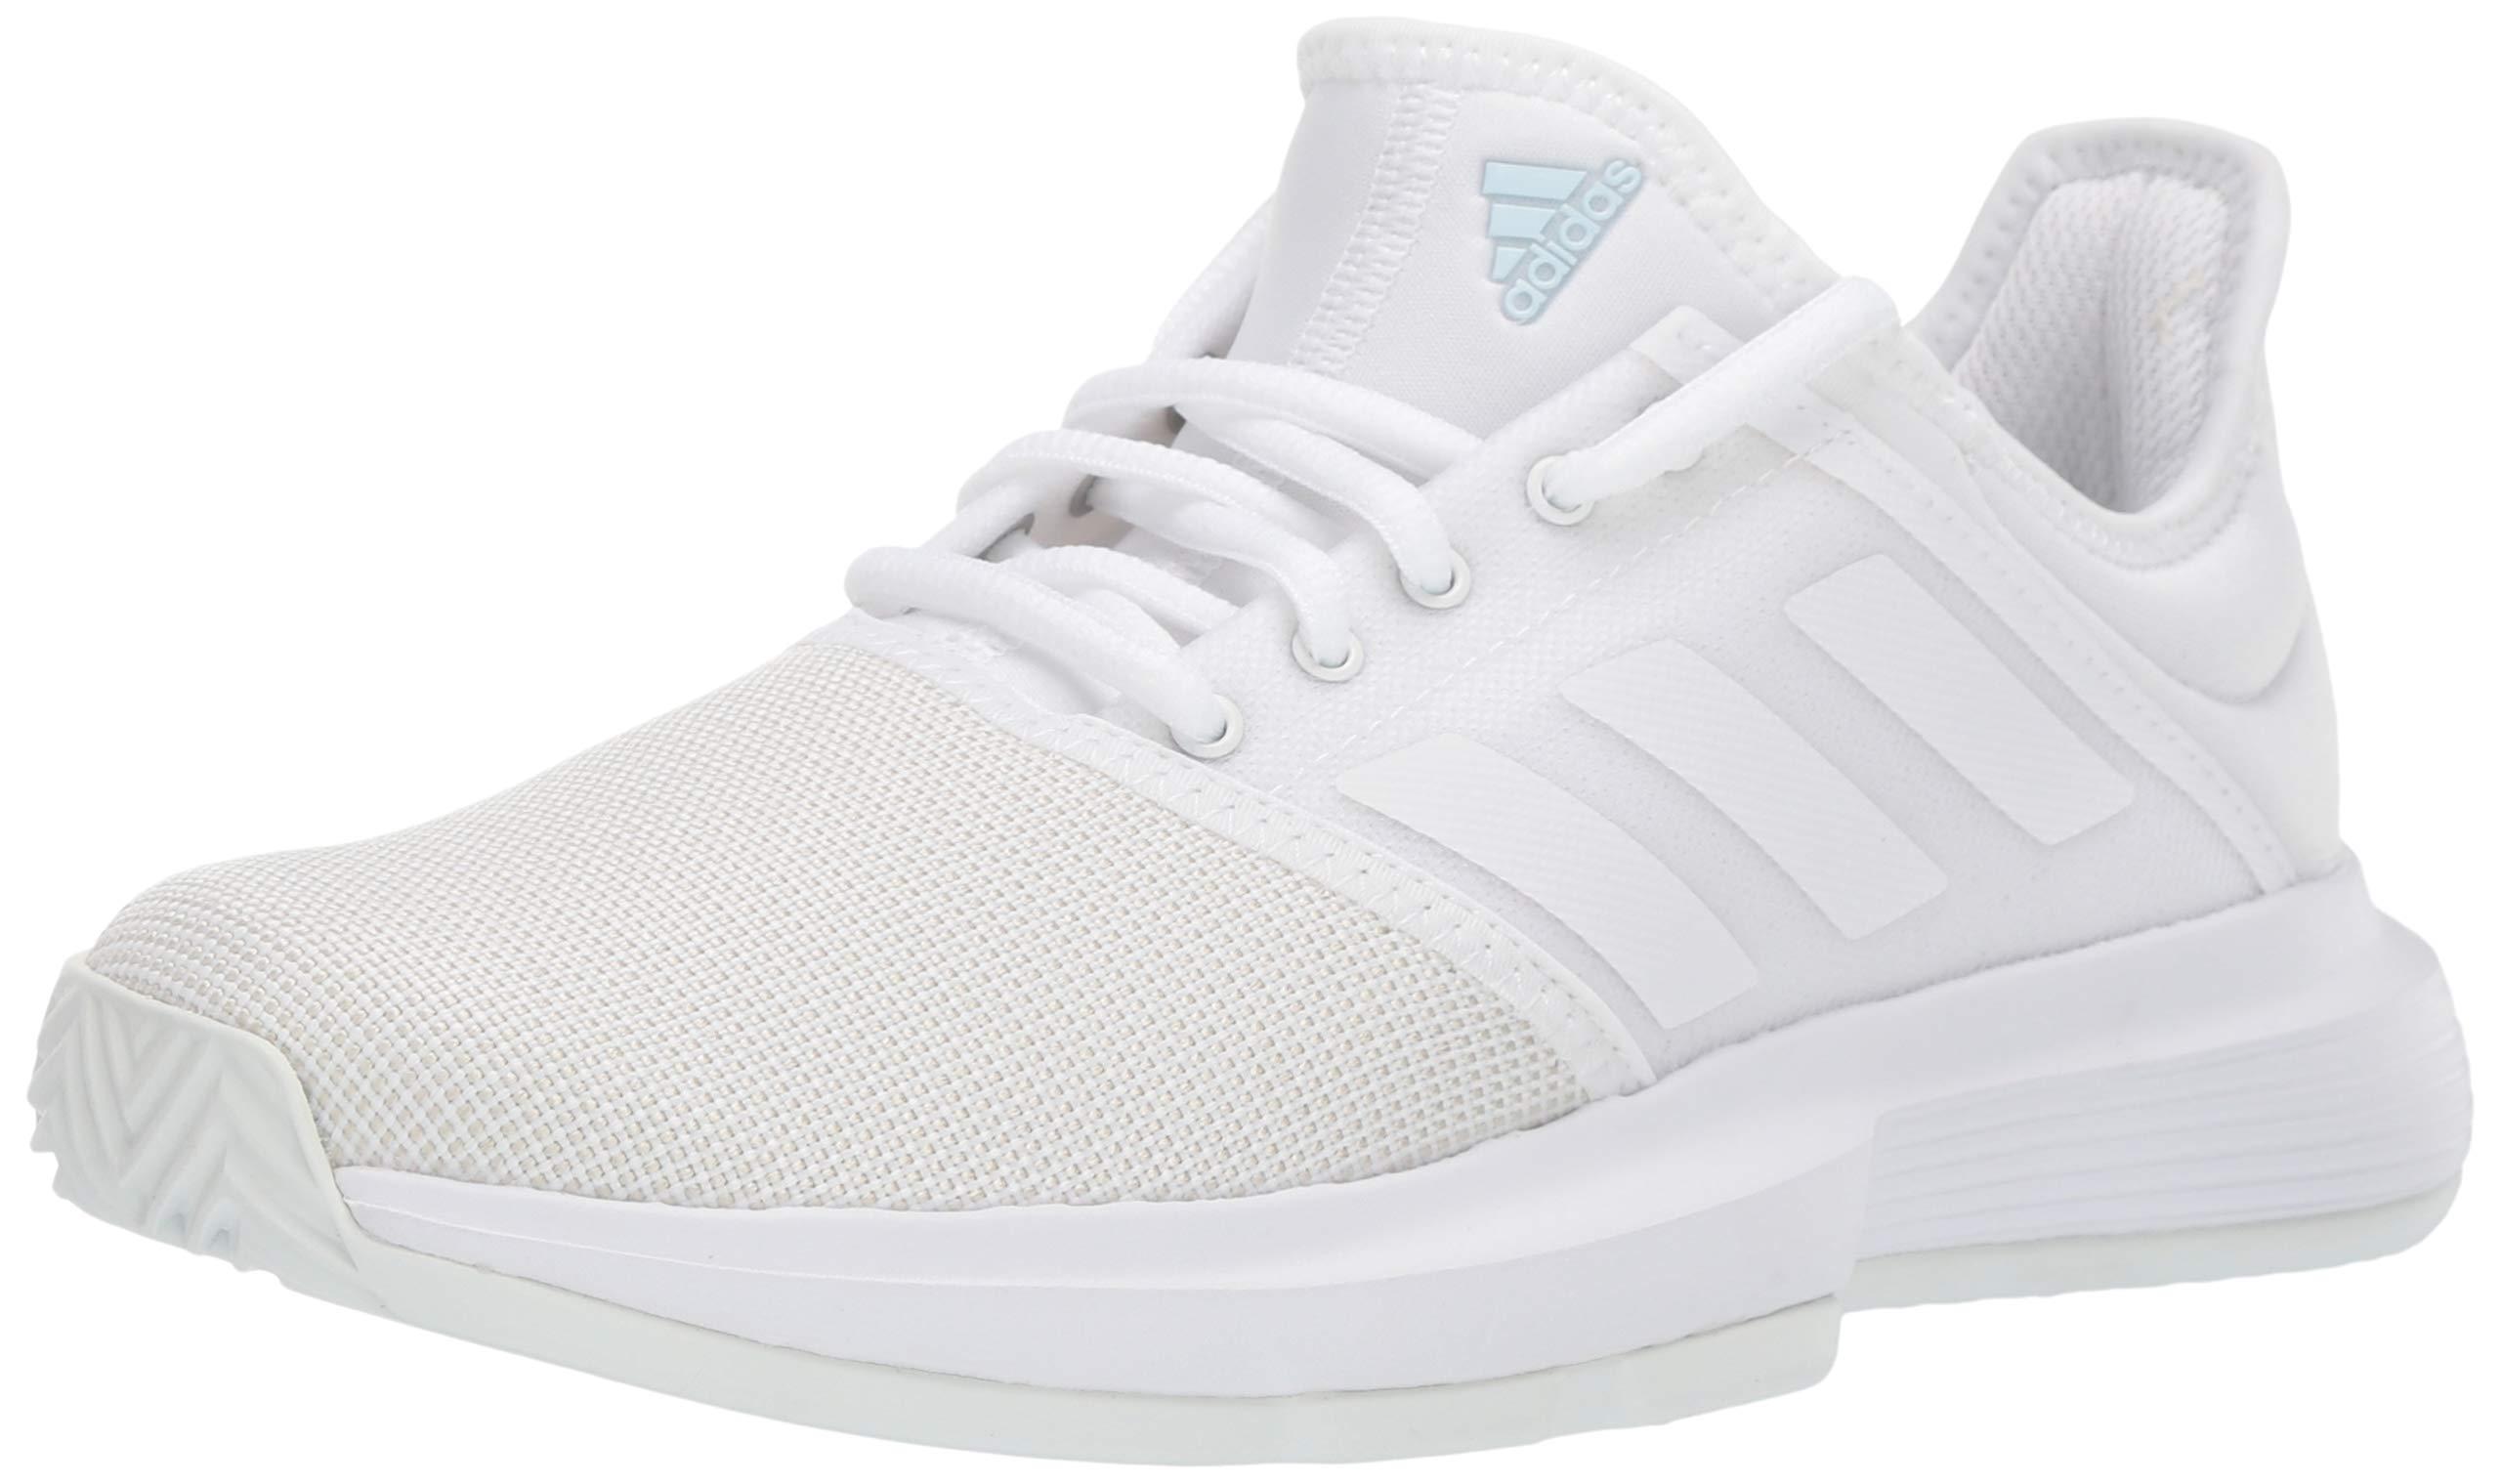 adidas Women's GameCourt Tennis Shoe, White/Blue Tint, 8 M US by adidas